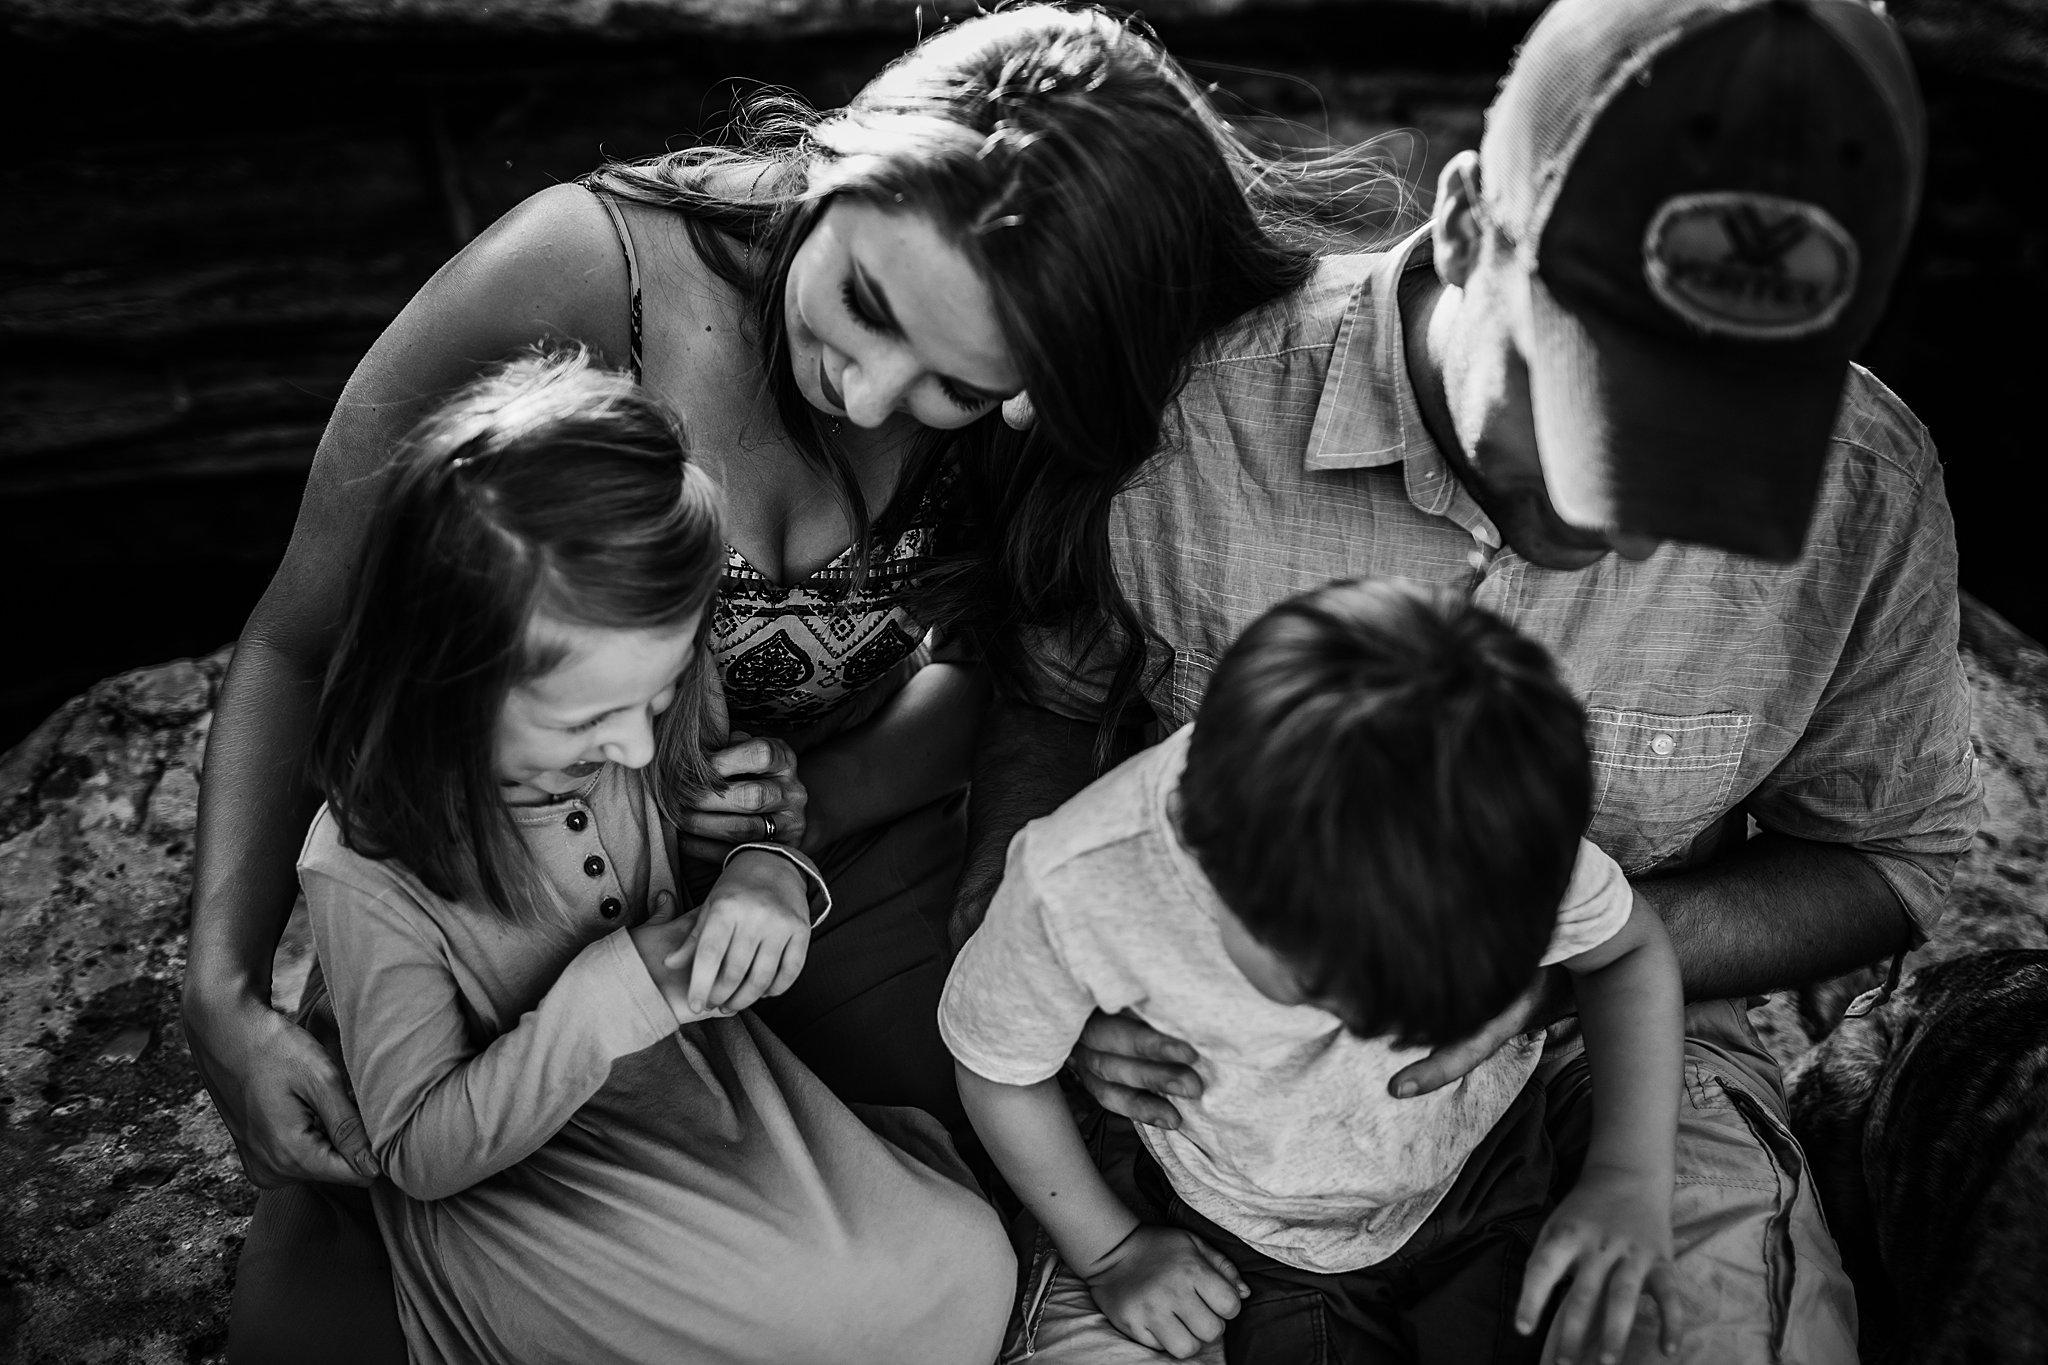 Tunnell-San-Antonio-Family-Photographer-3_WEB.jpg